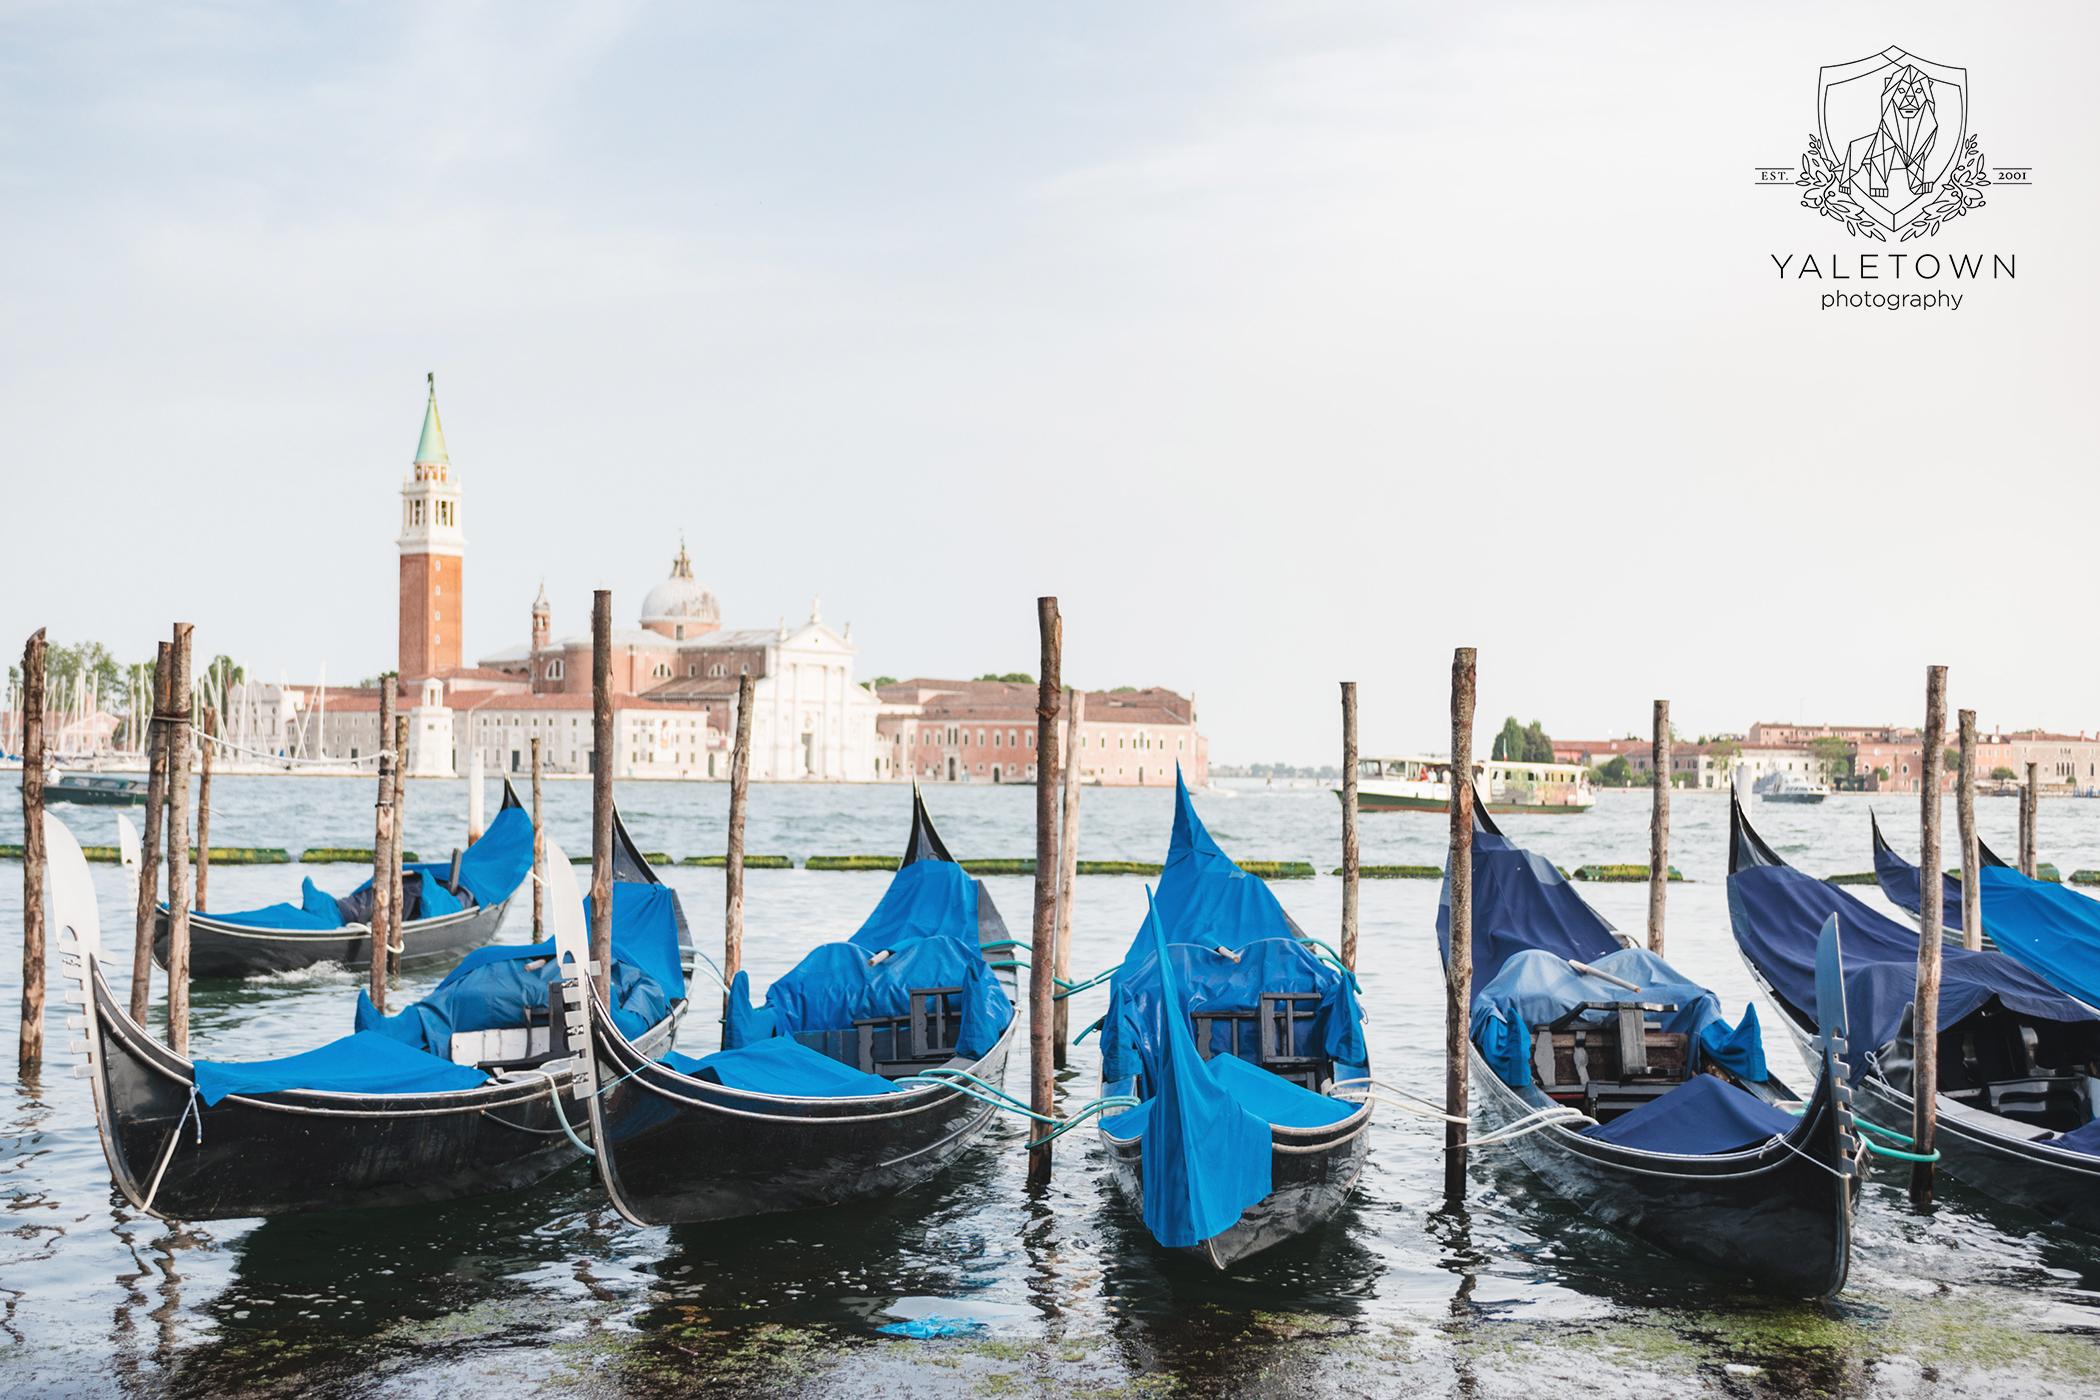 Venice-portrait-session-yaletown-photography-vacation-photographer-photo-007.jpg